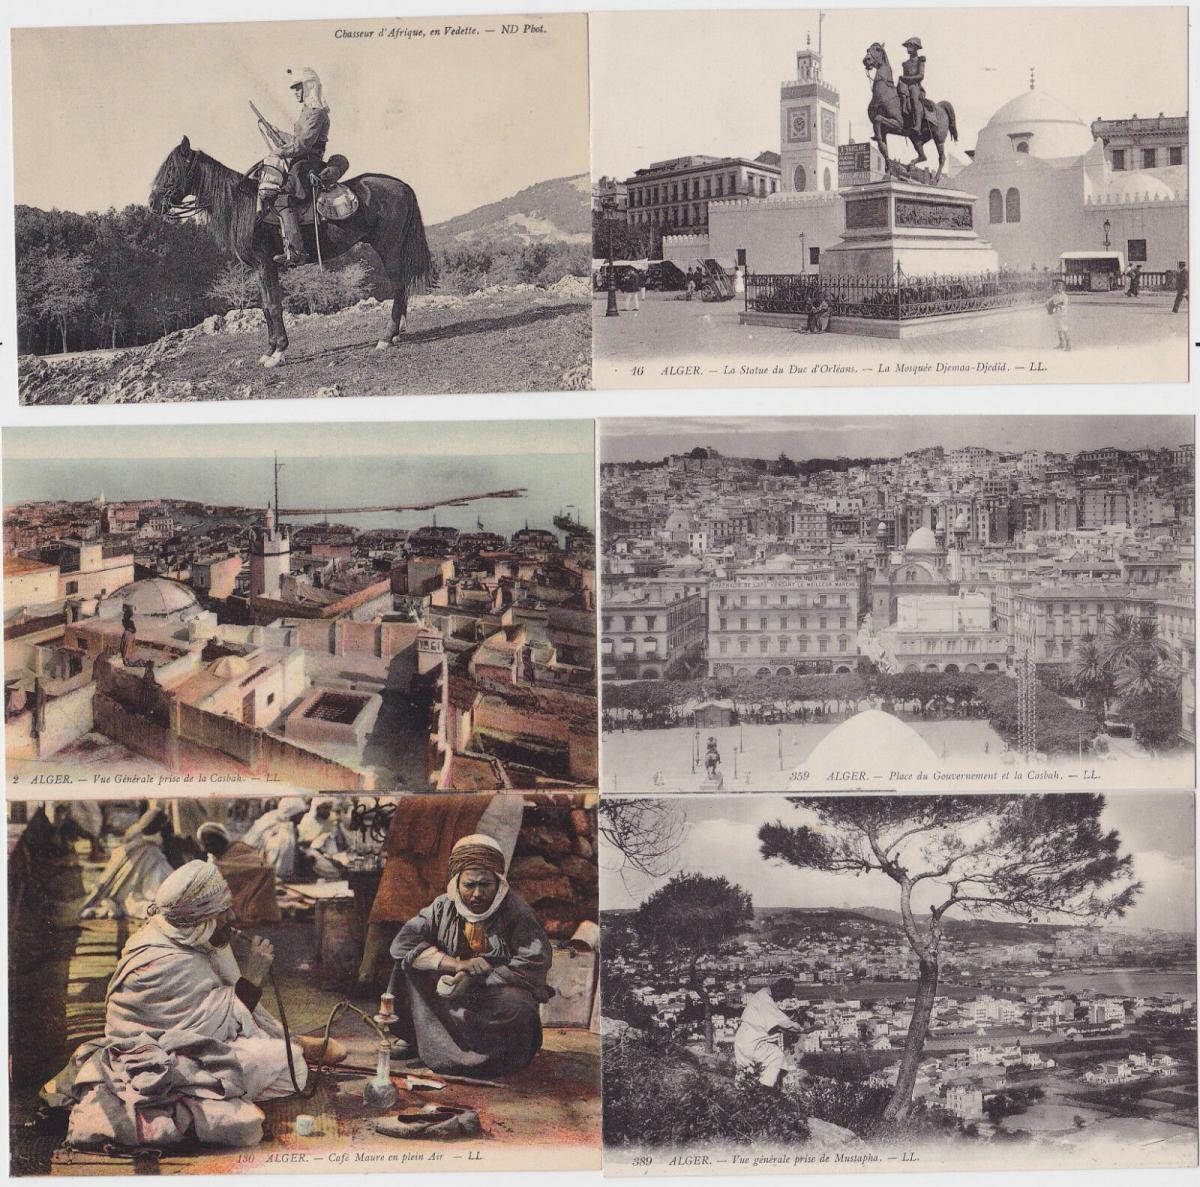 82661/6 Ak Alger Algier Algerien Ortsansichten 1914 0